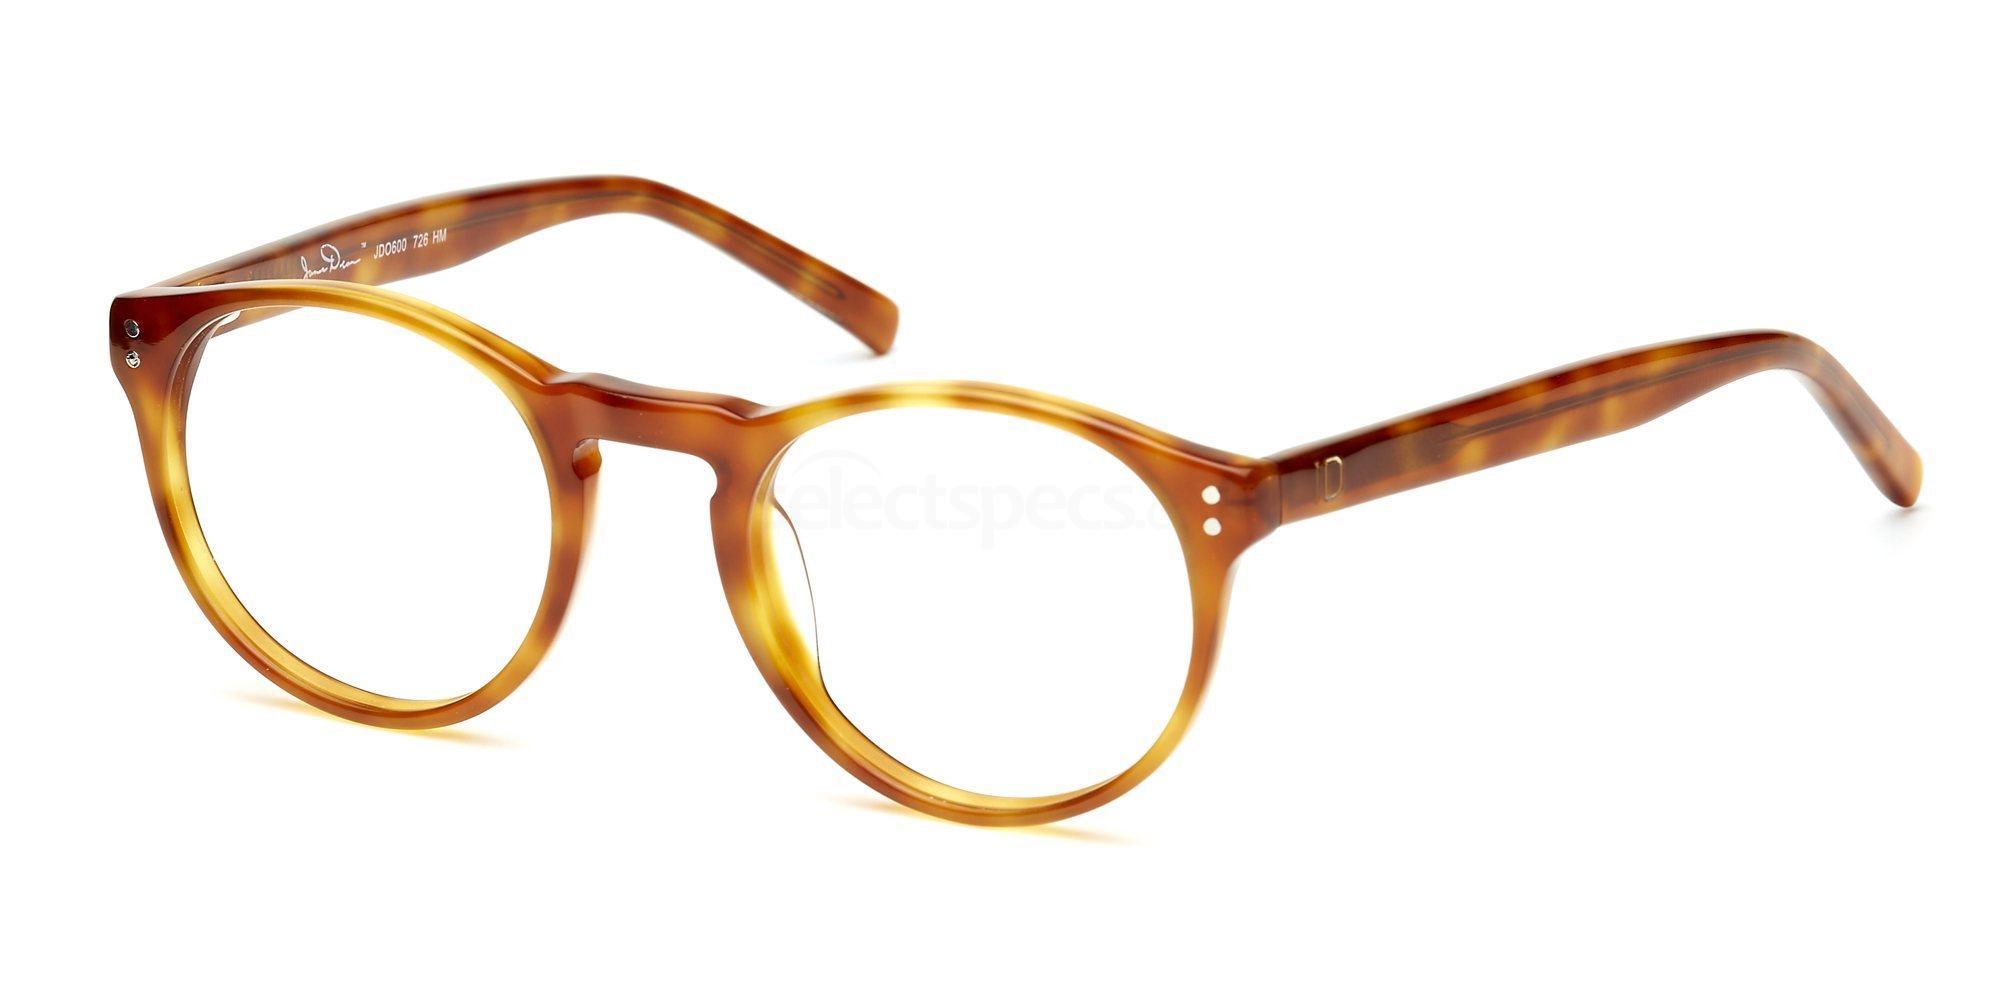 dean eyewear get the look of the 1950s legend